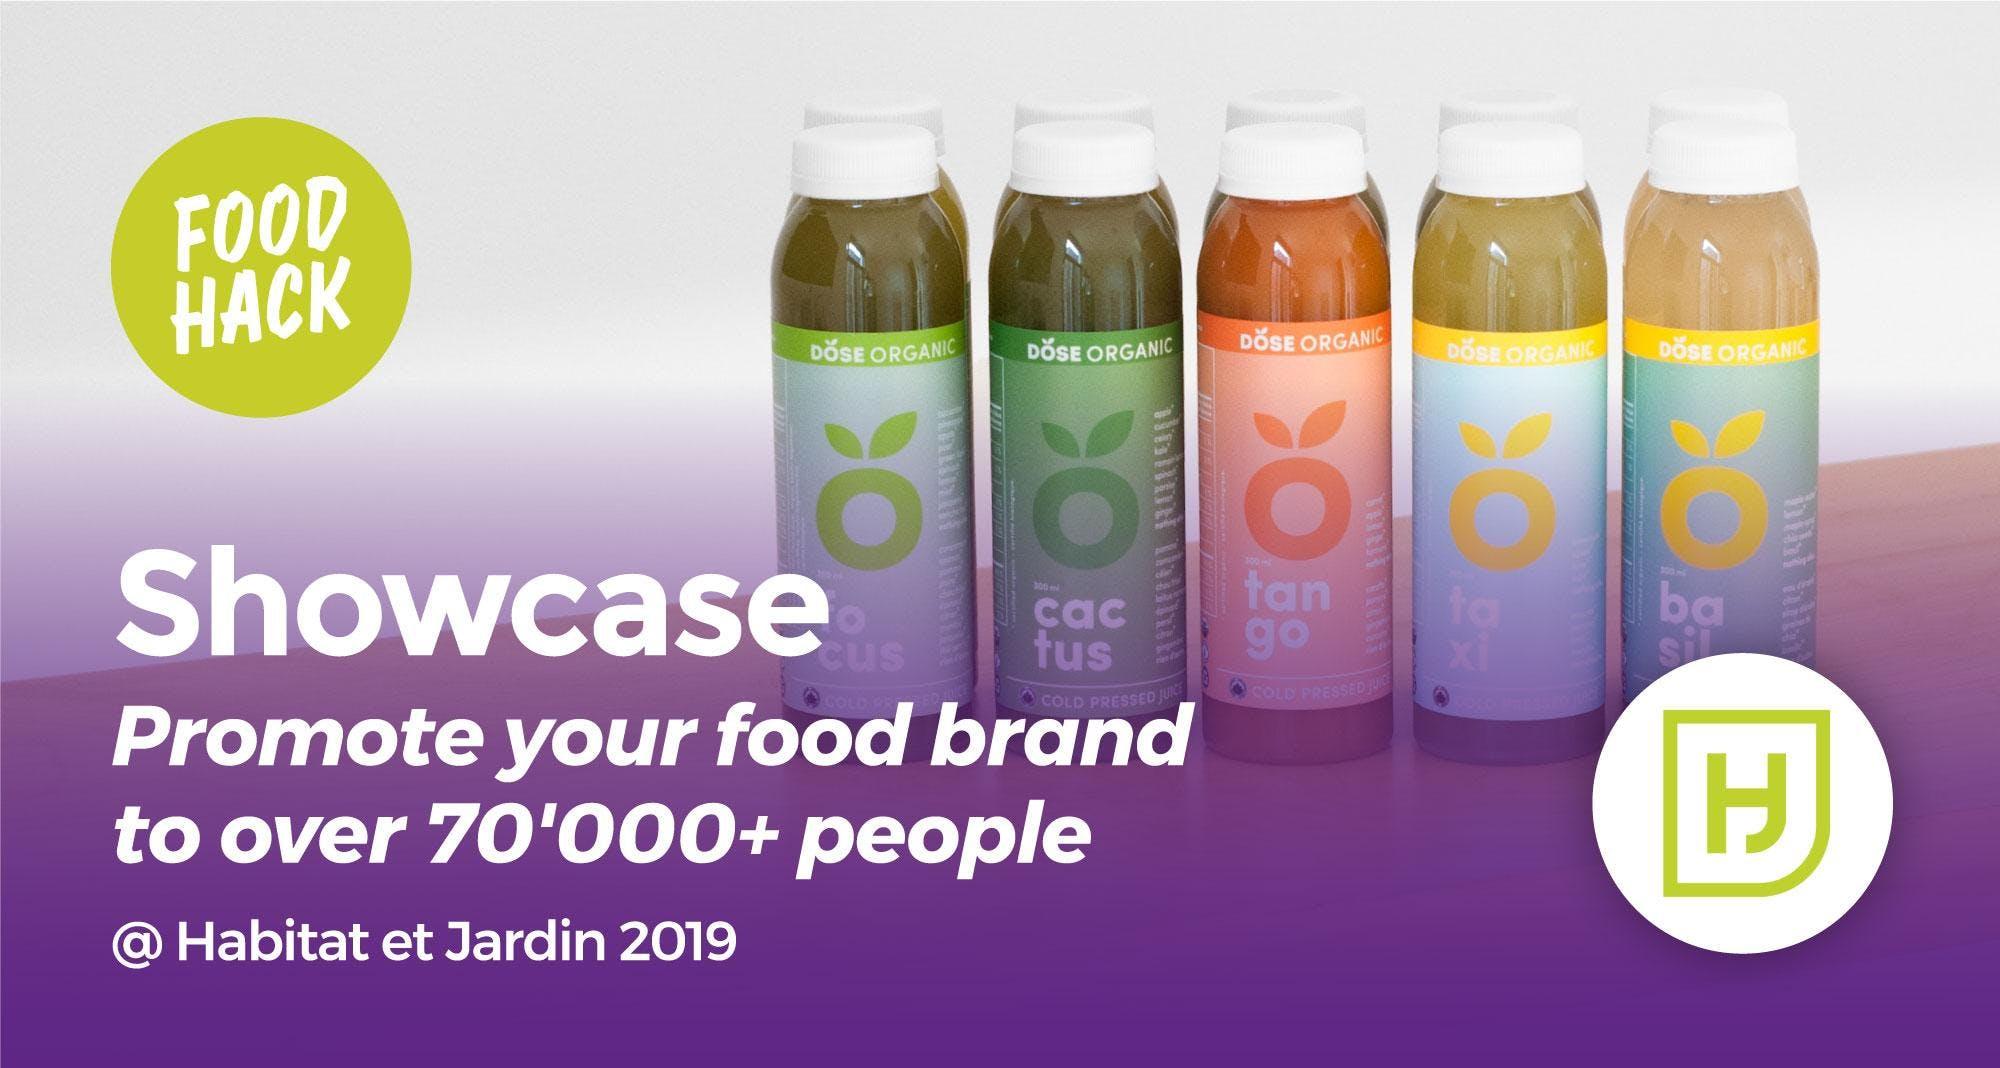 Showcase Your Brand at Habitat Jardin 2019